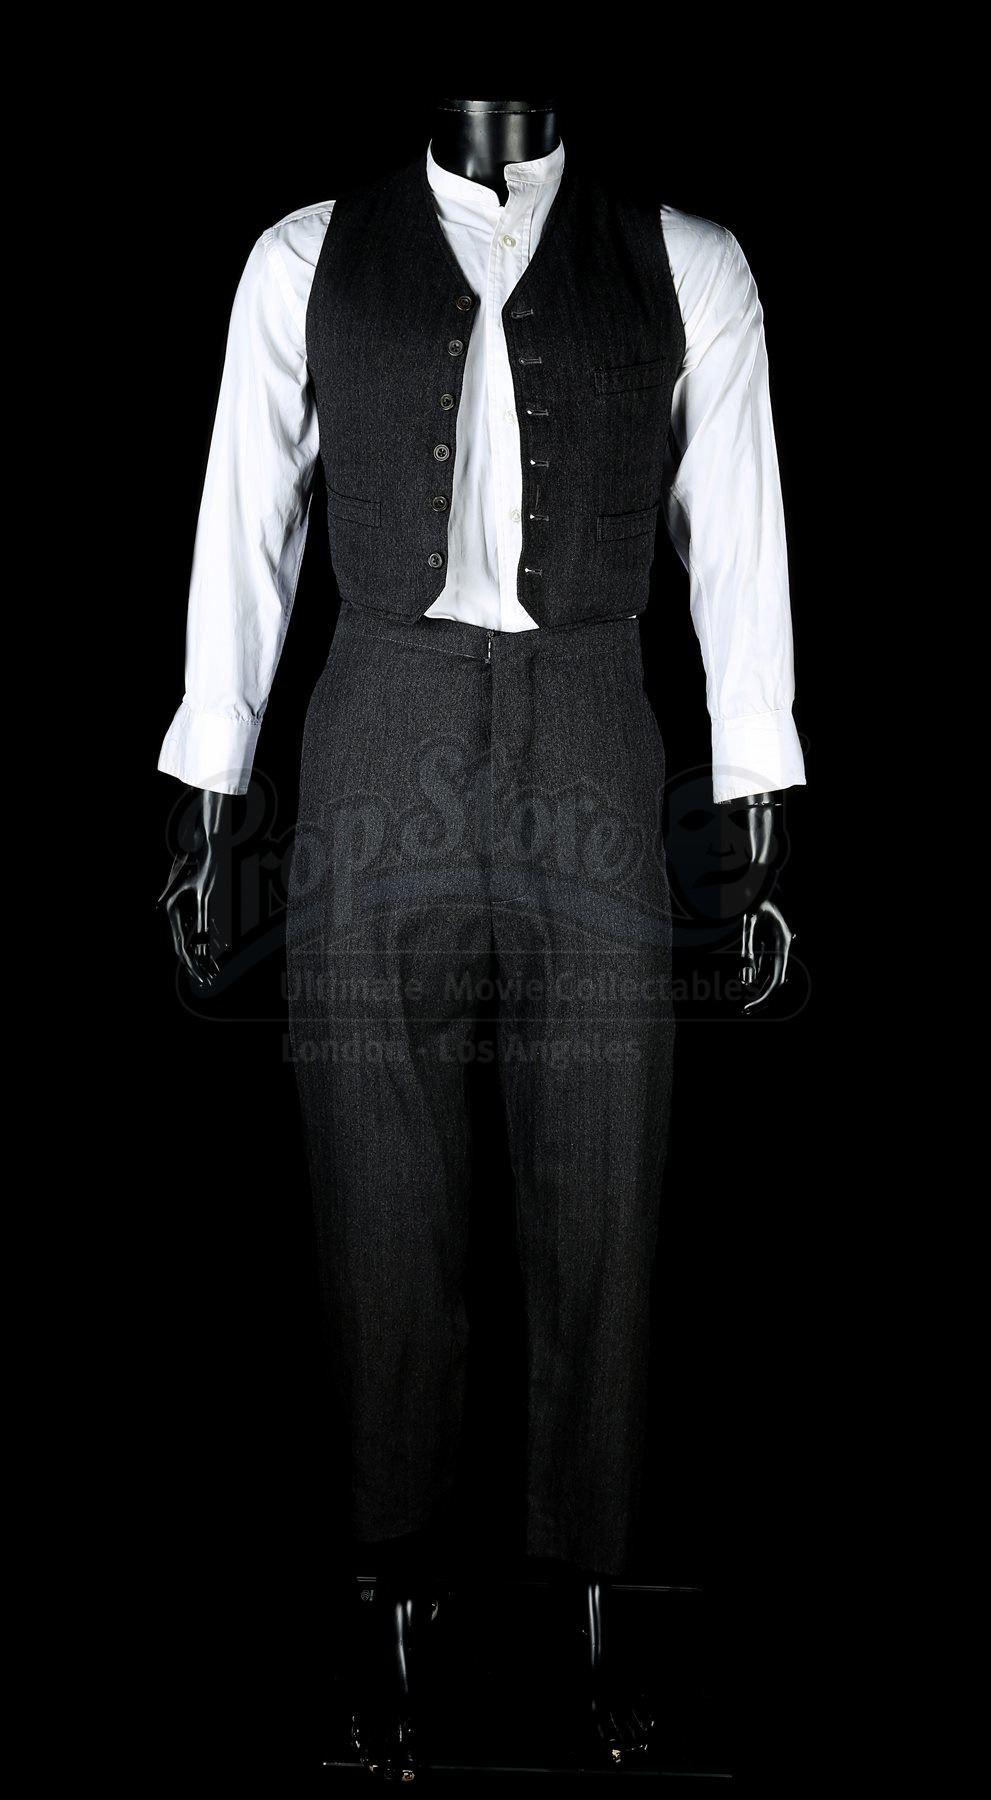 Alisa Khazanova the woman in black (2012) - arthur kipps' (daniel radcliffe) costume